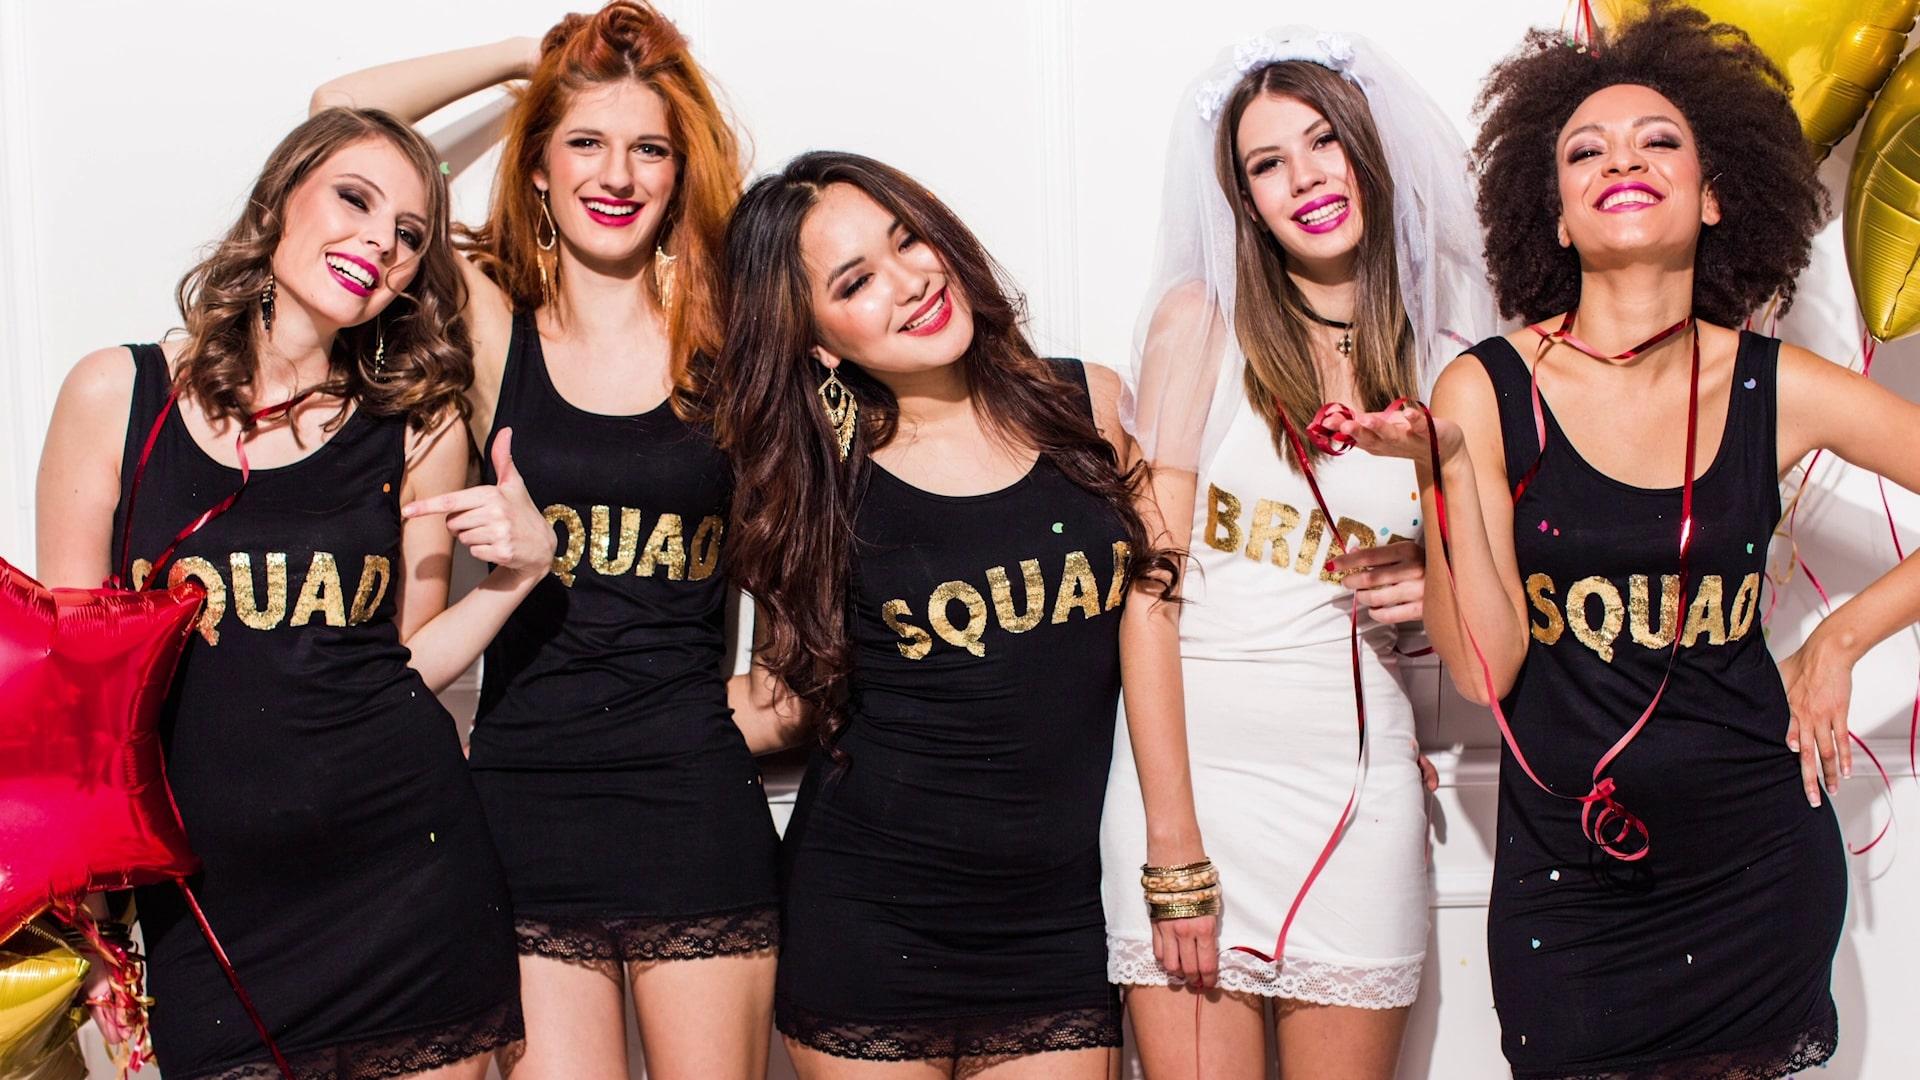 Heat Transfer Vinyl T-Shirts for Bachelorette Party | Coastal Business Supplies